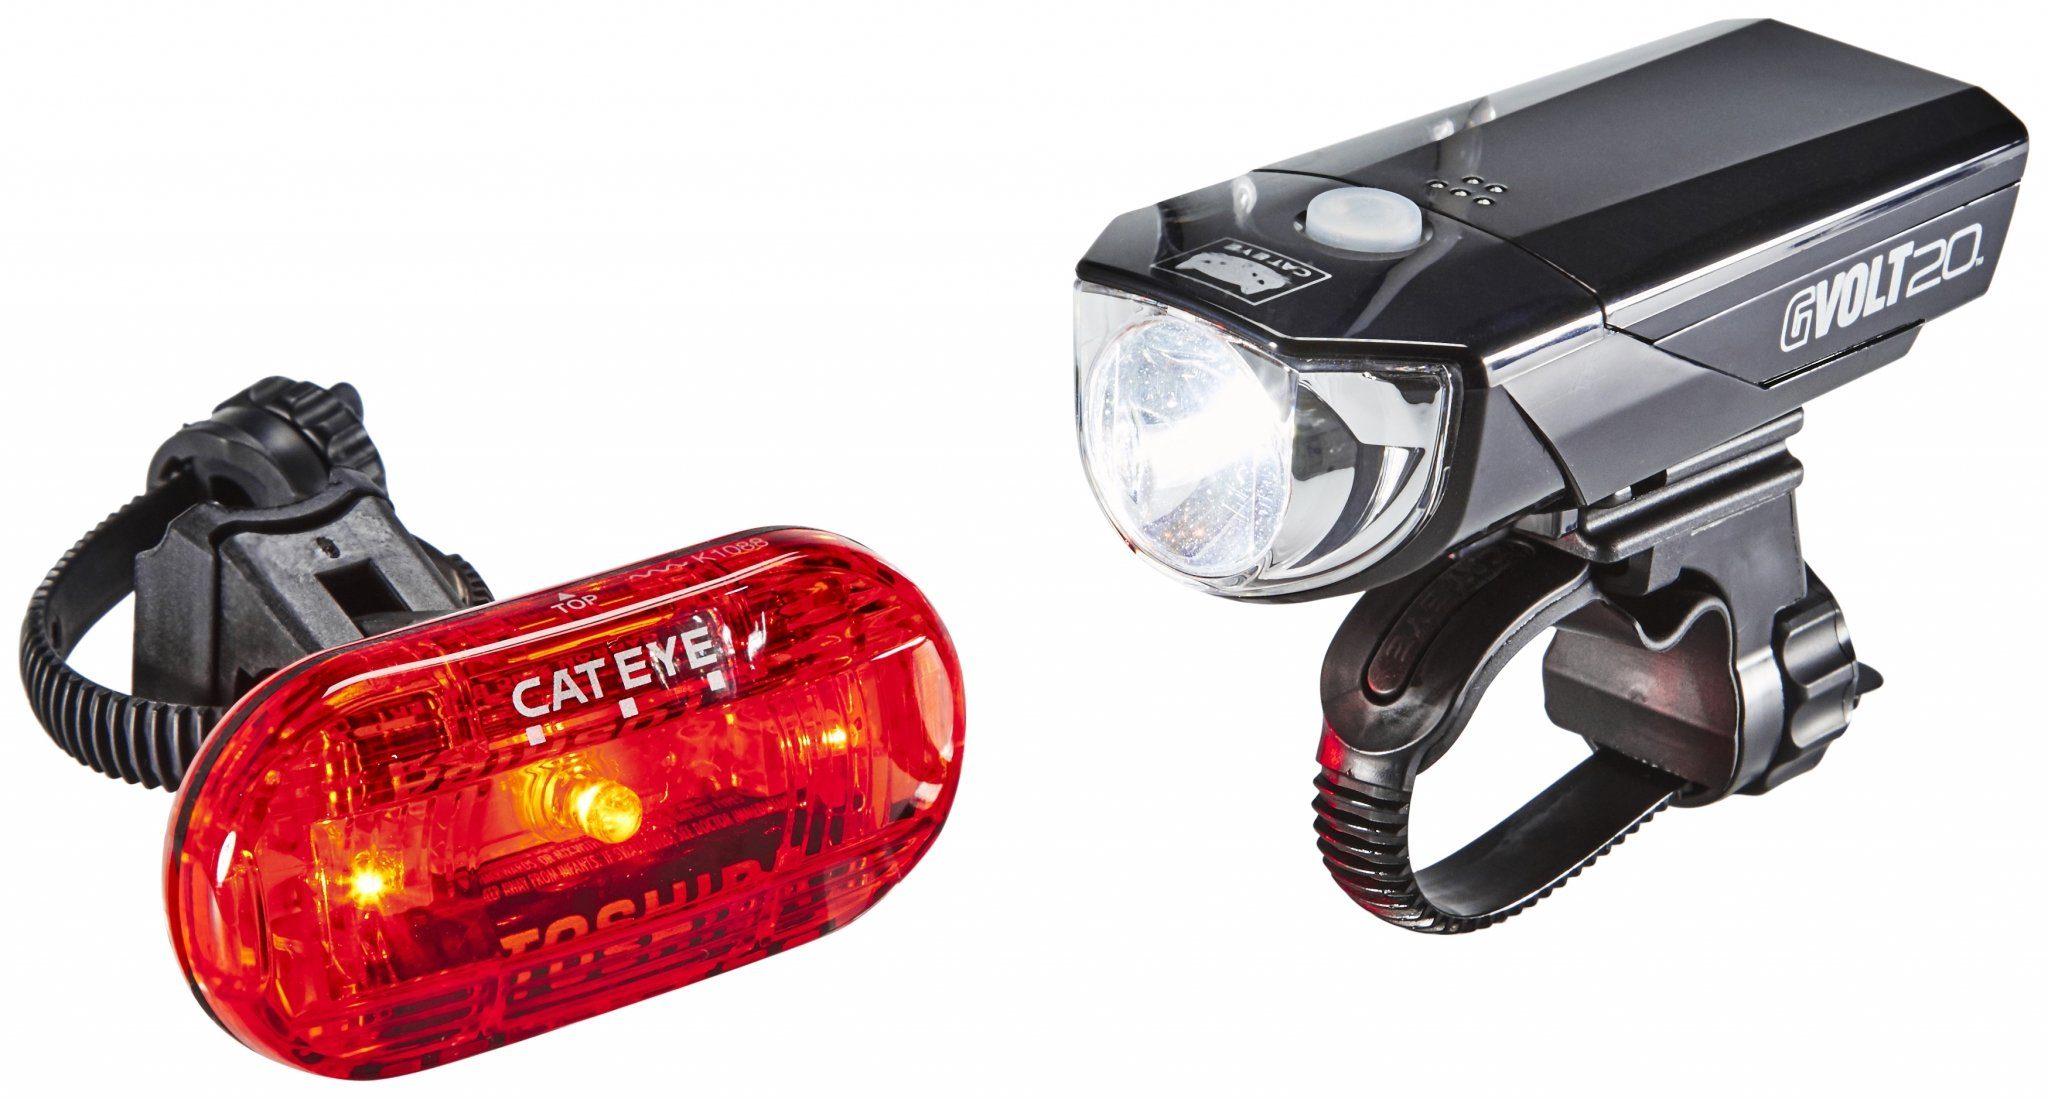 Cateye Fahrradbeleuchtung »GVOLT20/OMNI3G«